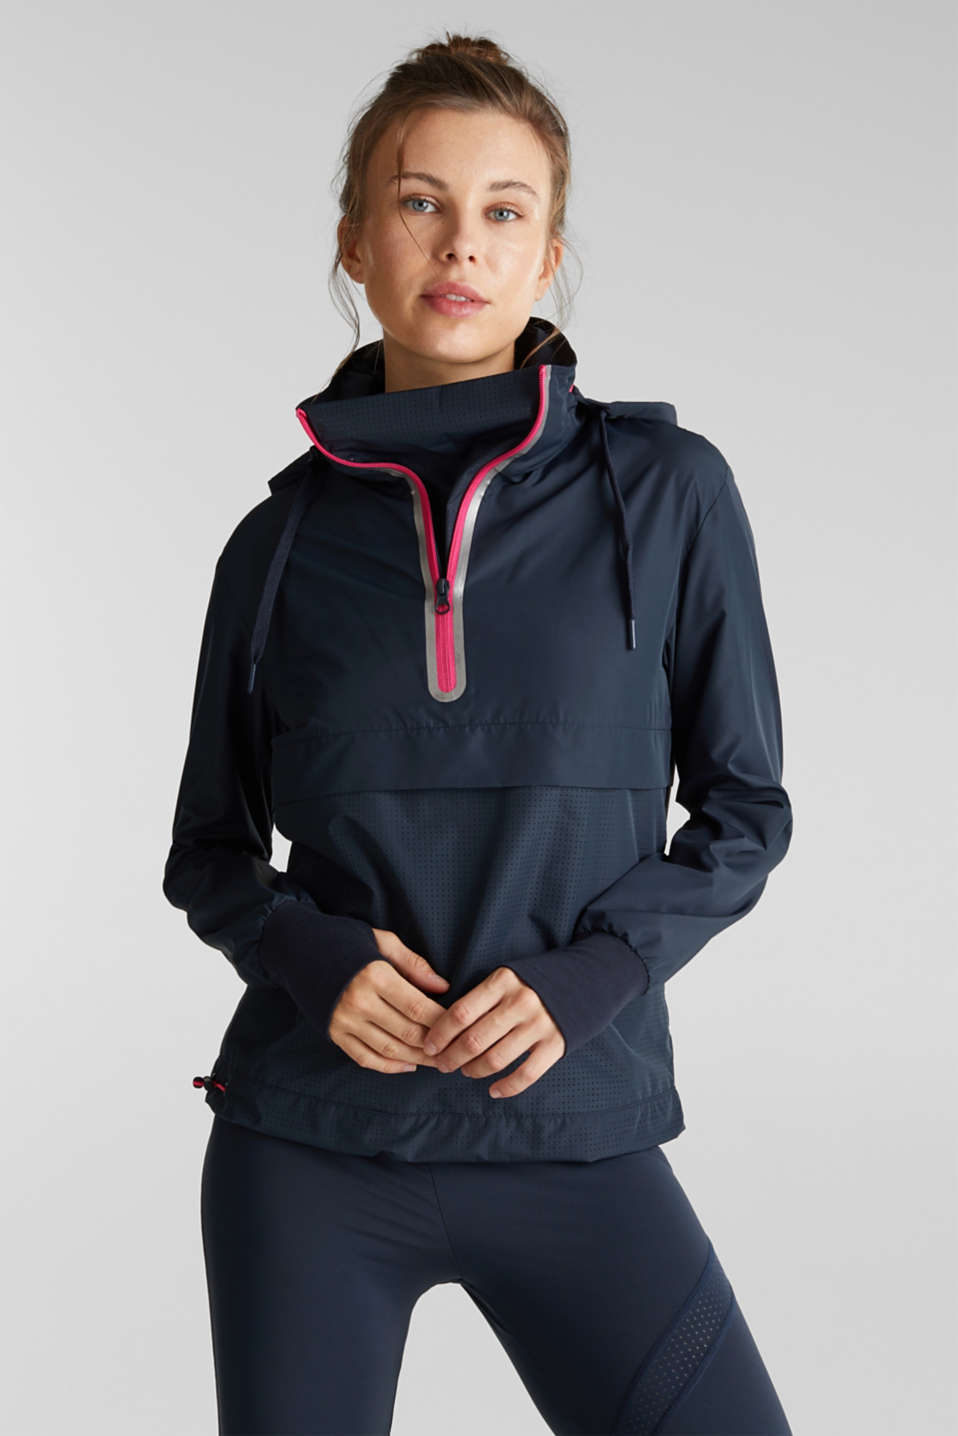 Esprit Lightweight hooded outdoor jacket at our Online Shop